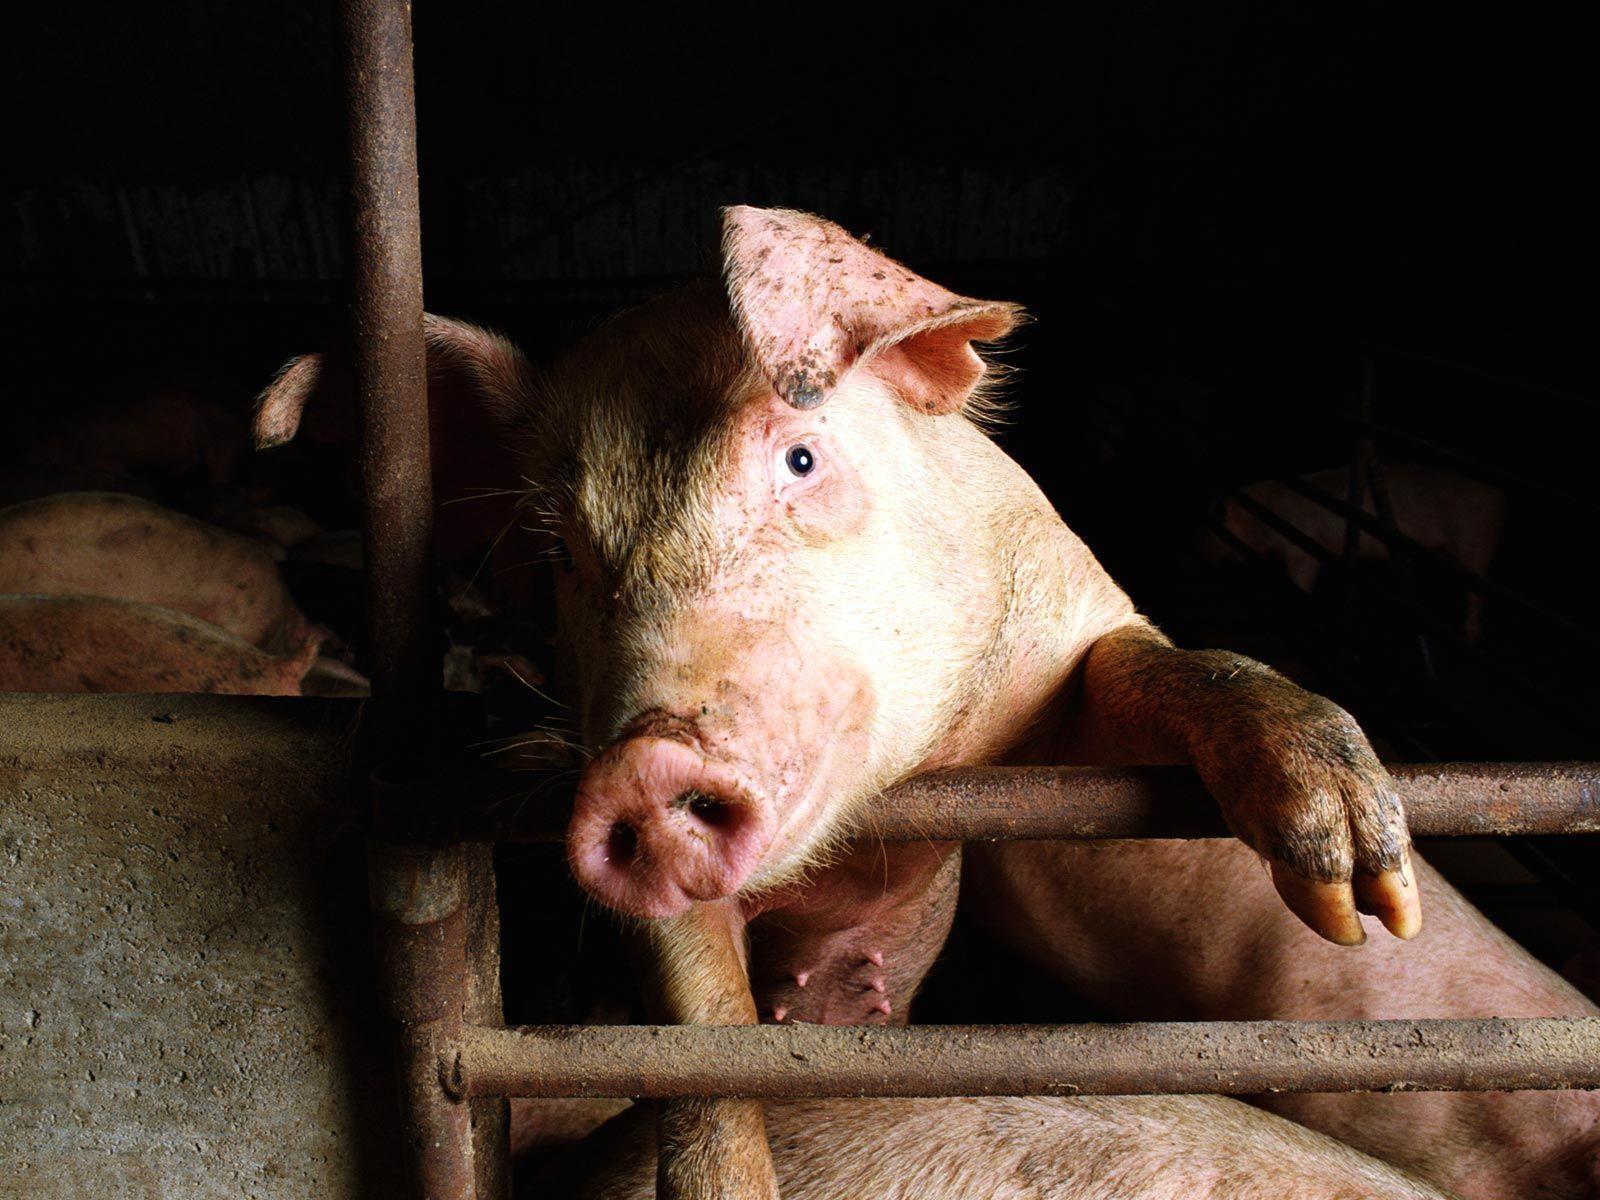 Pig HQ wallpaper - Animal Backgrounds